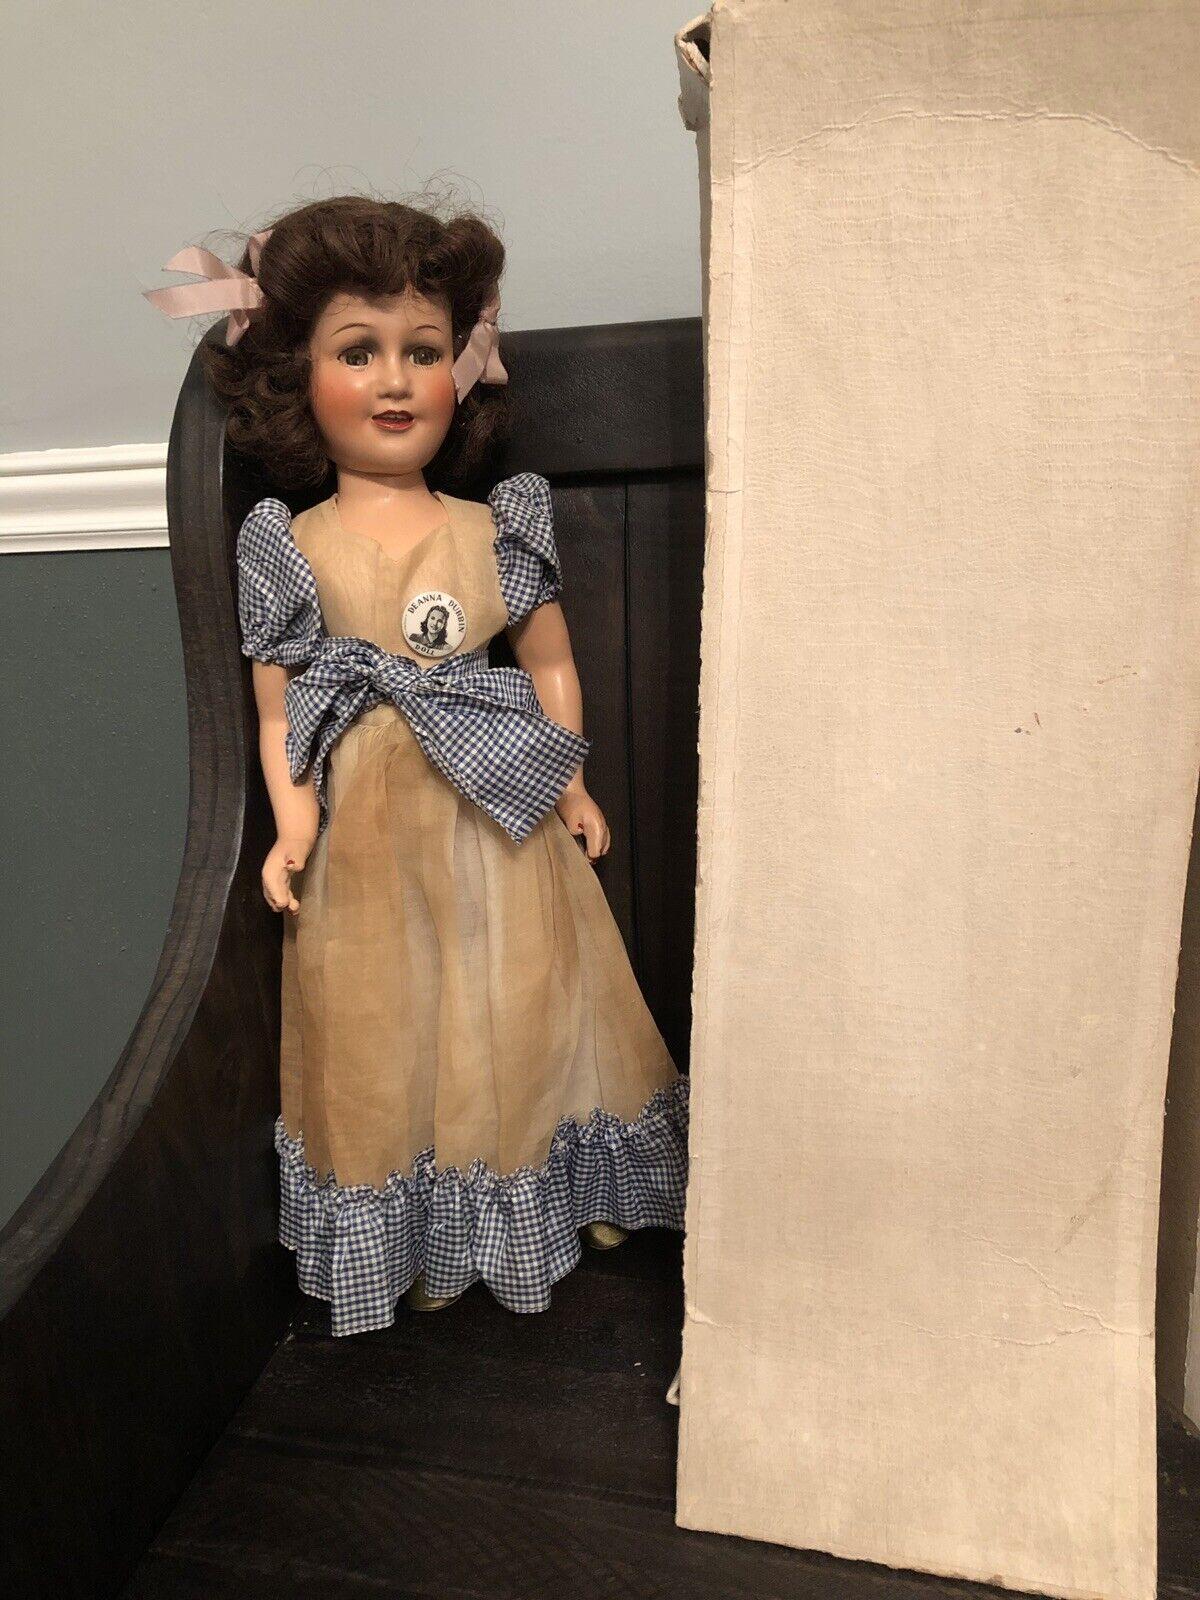 "Vintage Excellent Condition 17"" Deanna Durbin Composition Doll All Original Box"